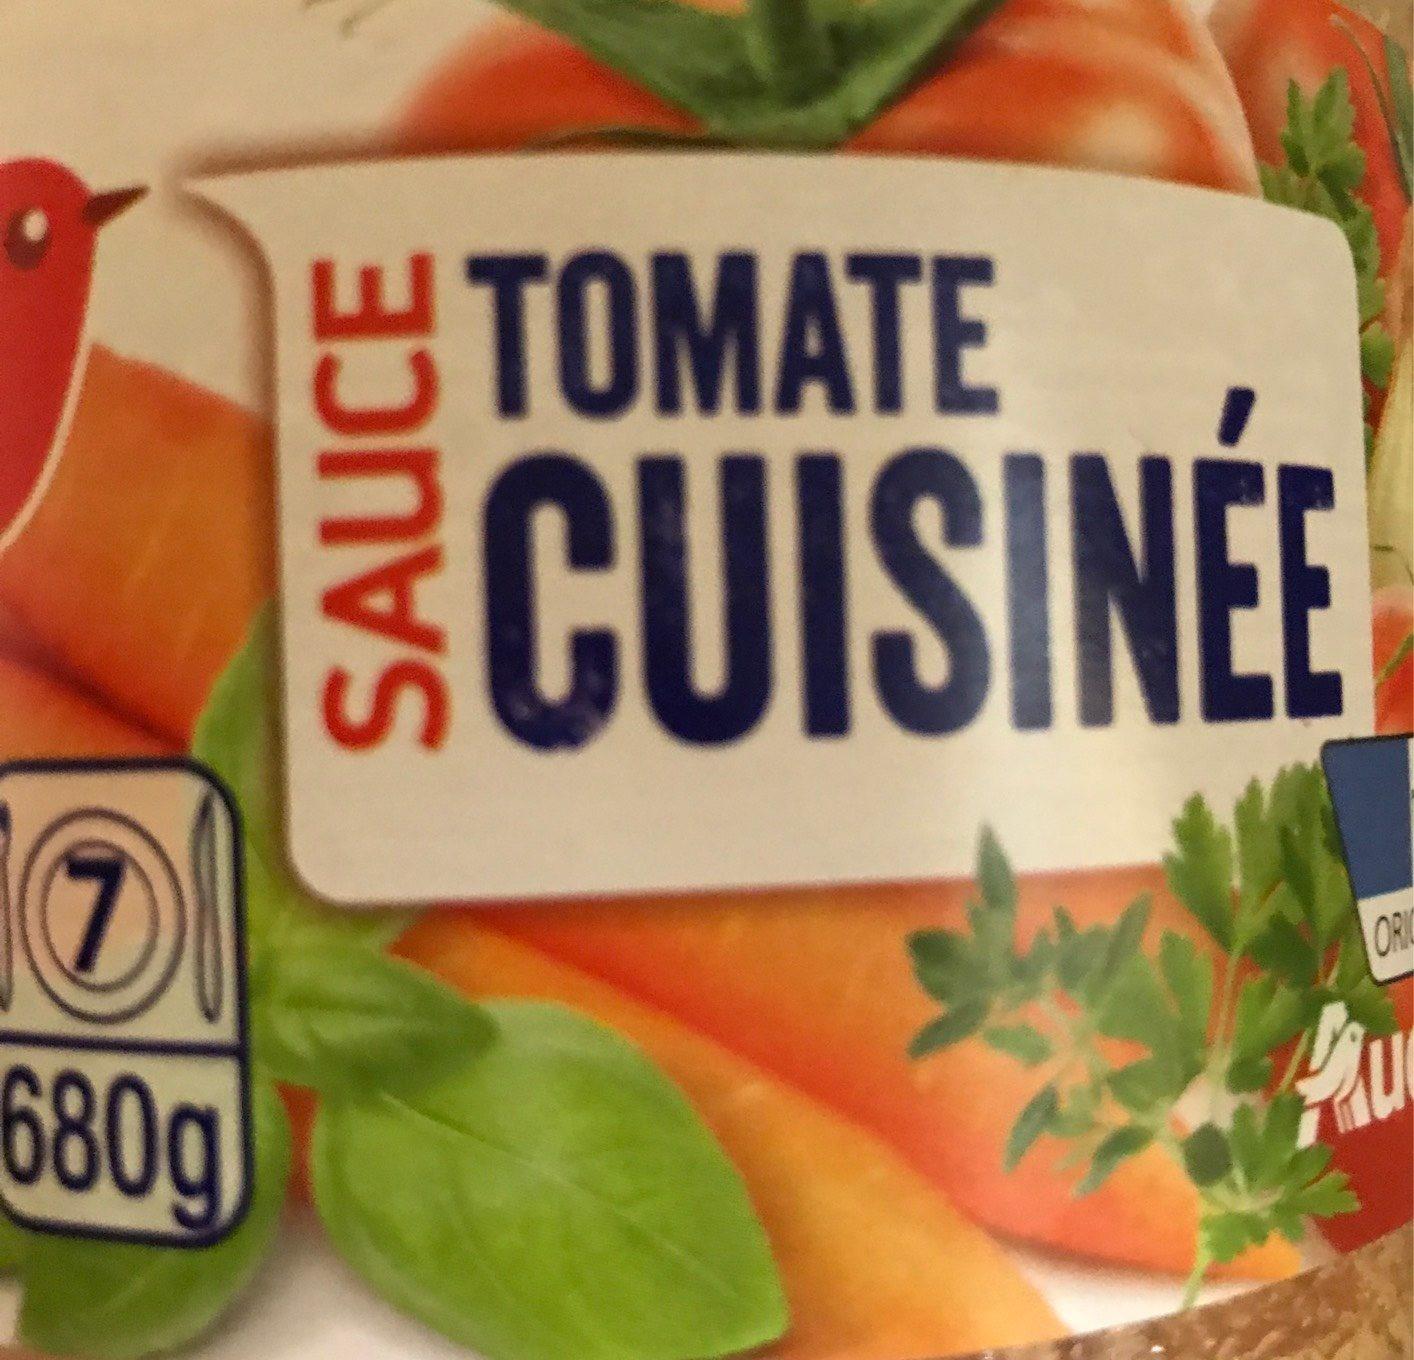 Sauce tomate cuisinee - Produit - fr